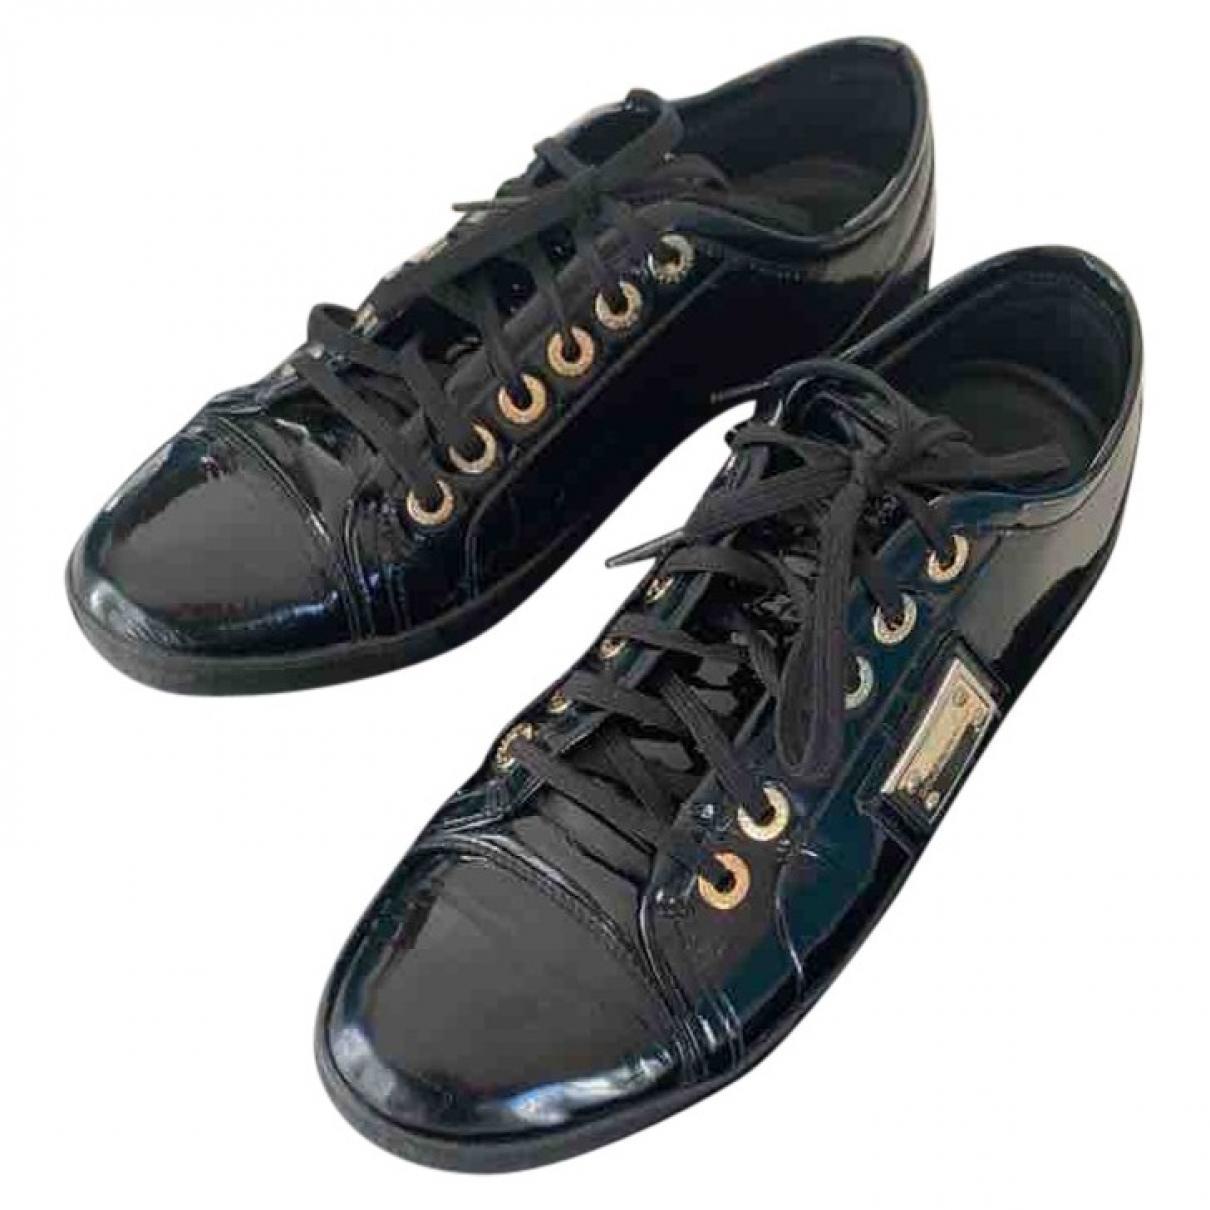 Dolce & Gabbana \N Sneakers in  Schwarz Lackleder